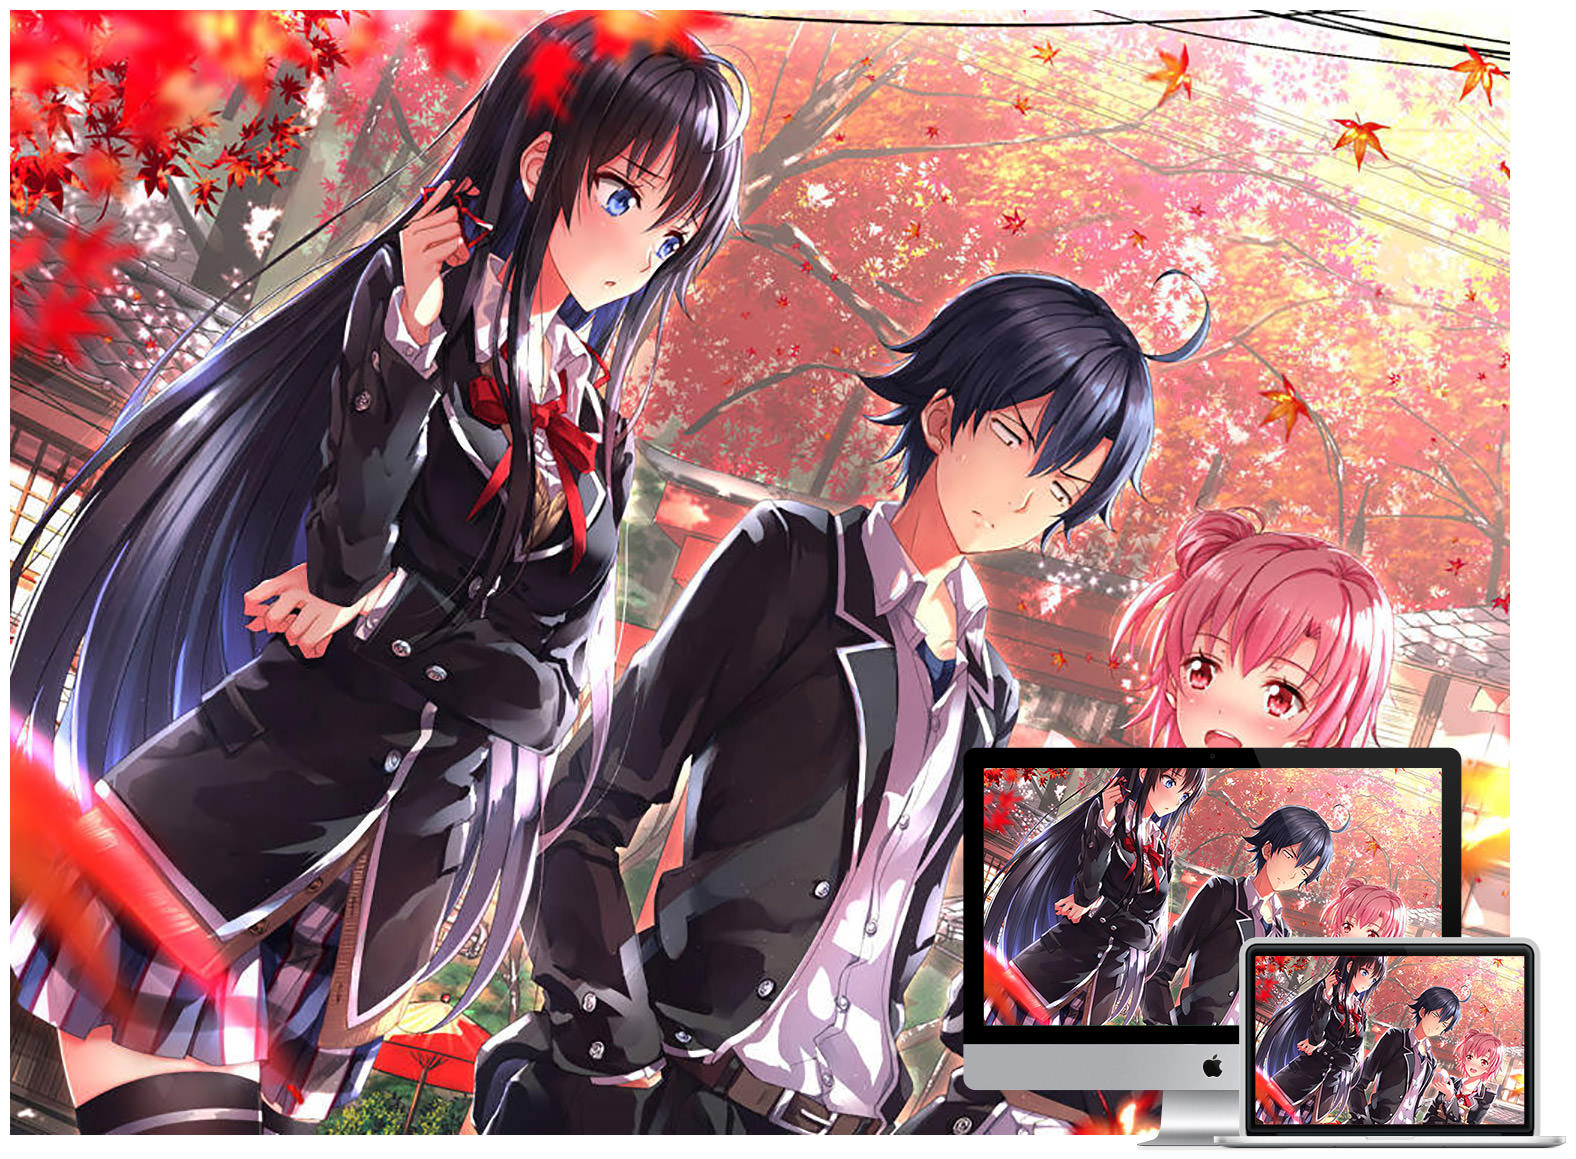 40 Beautiful Anime And Manga Wallpapers Hongkiat